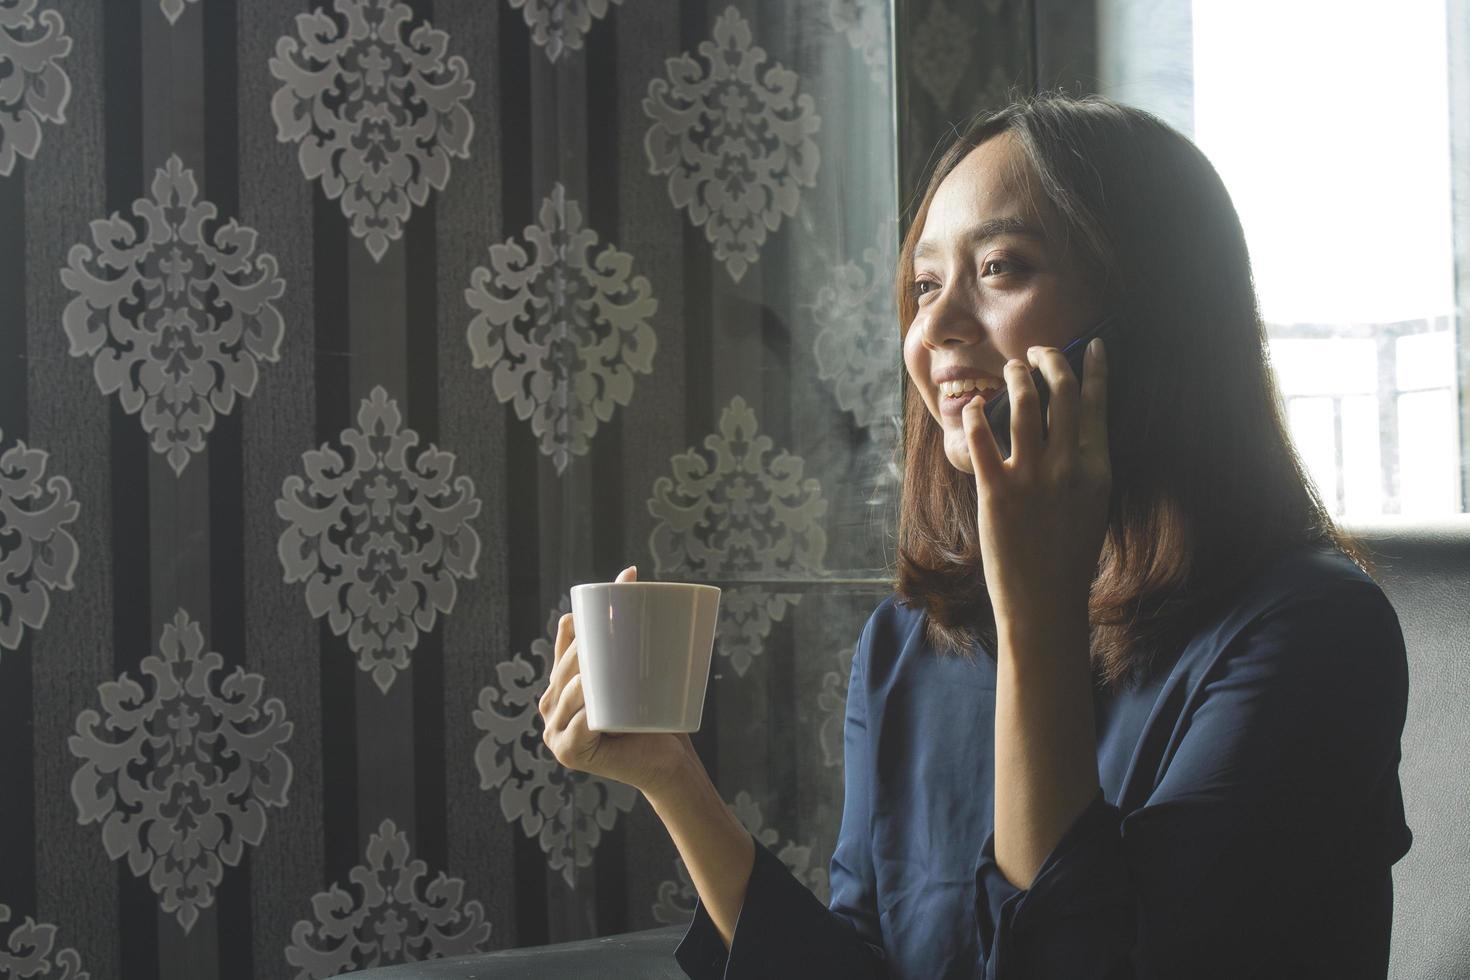 ontspannen lachende aziatische vrouw die koffie drinkt terwijl ze belt over werk foto